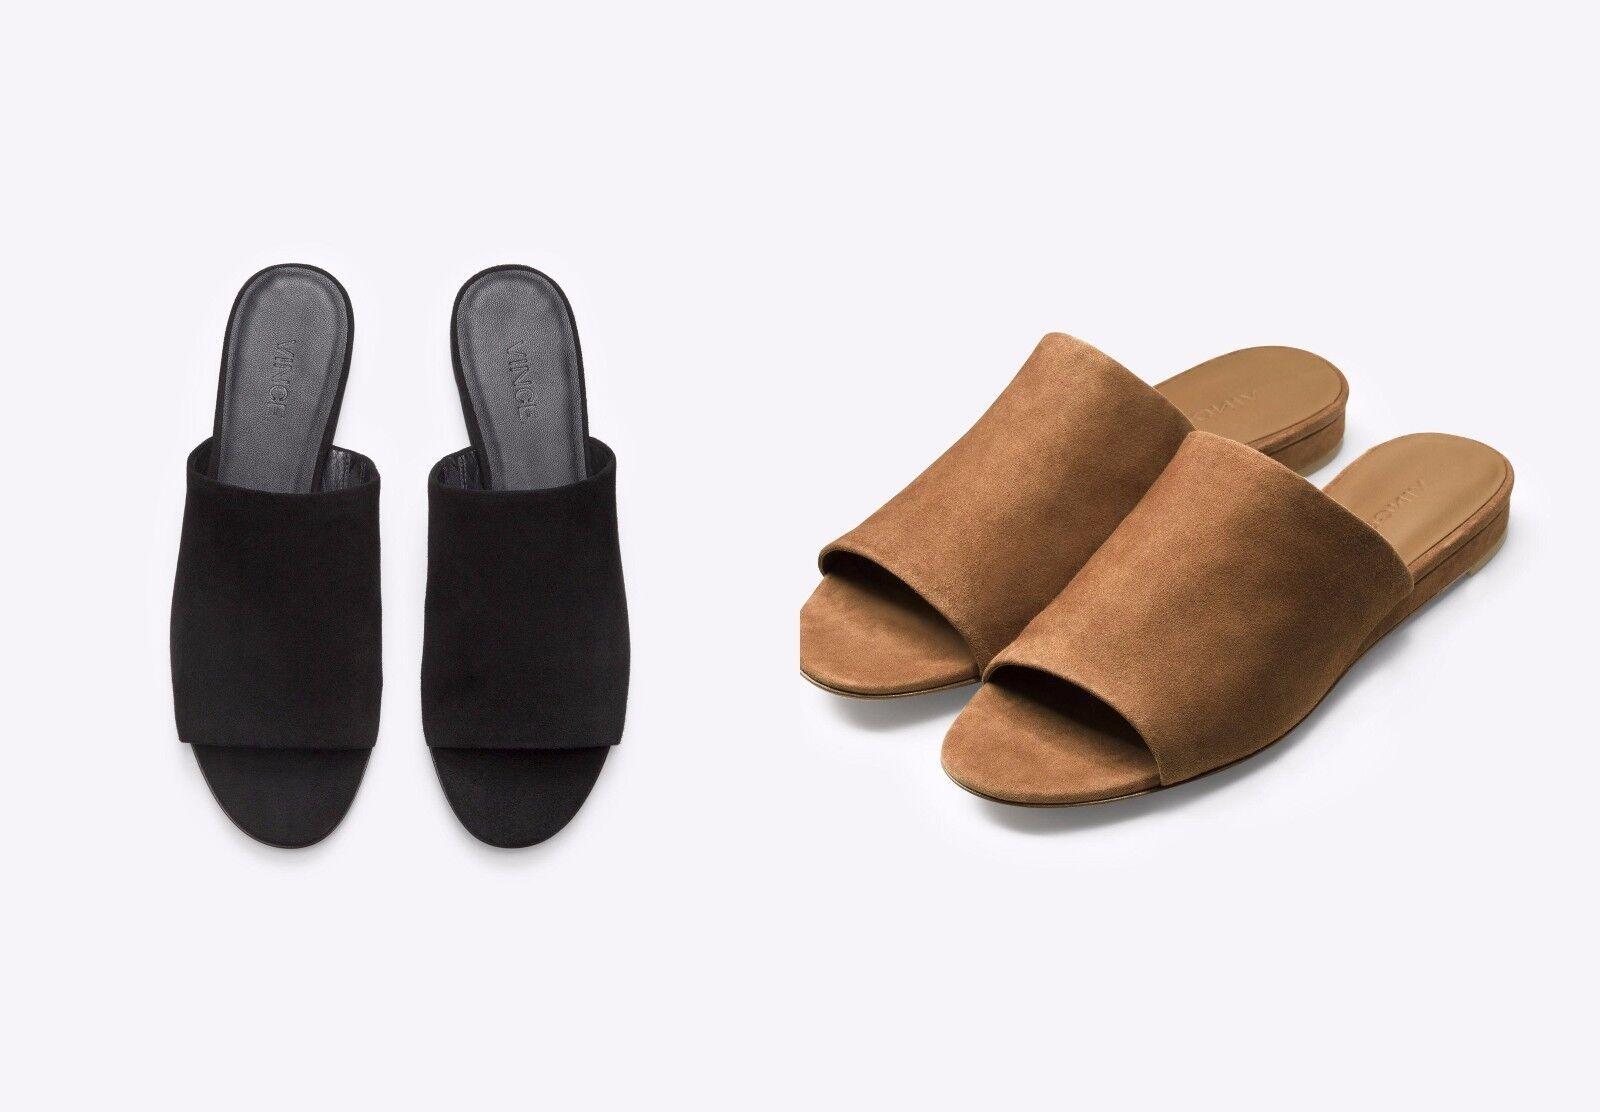 NIB Vince Bartley 2 Italian Suede Leather Slide Sandal Mule Black & Cedar  225